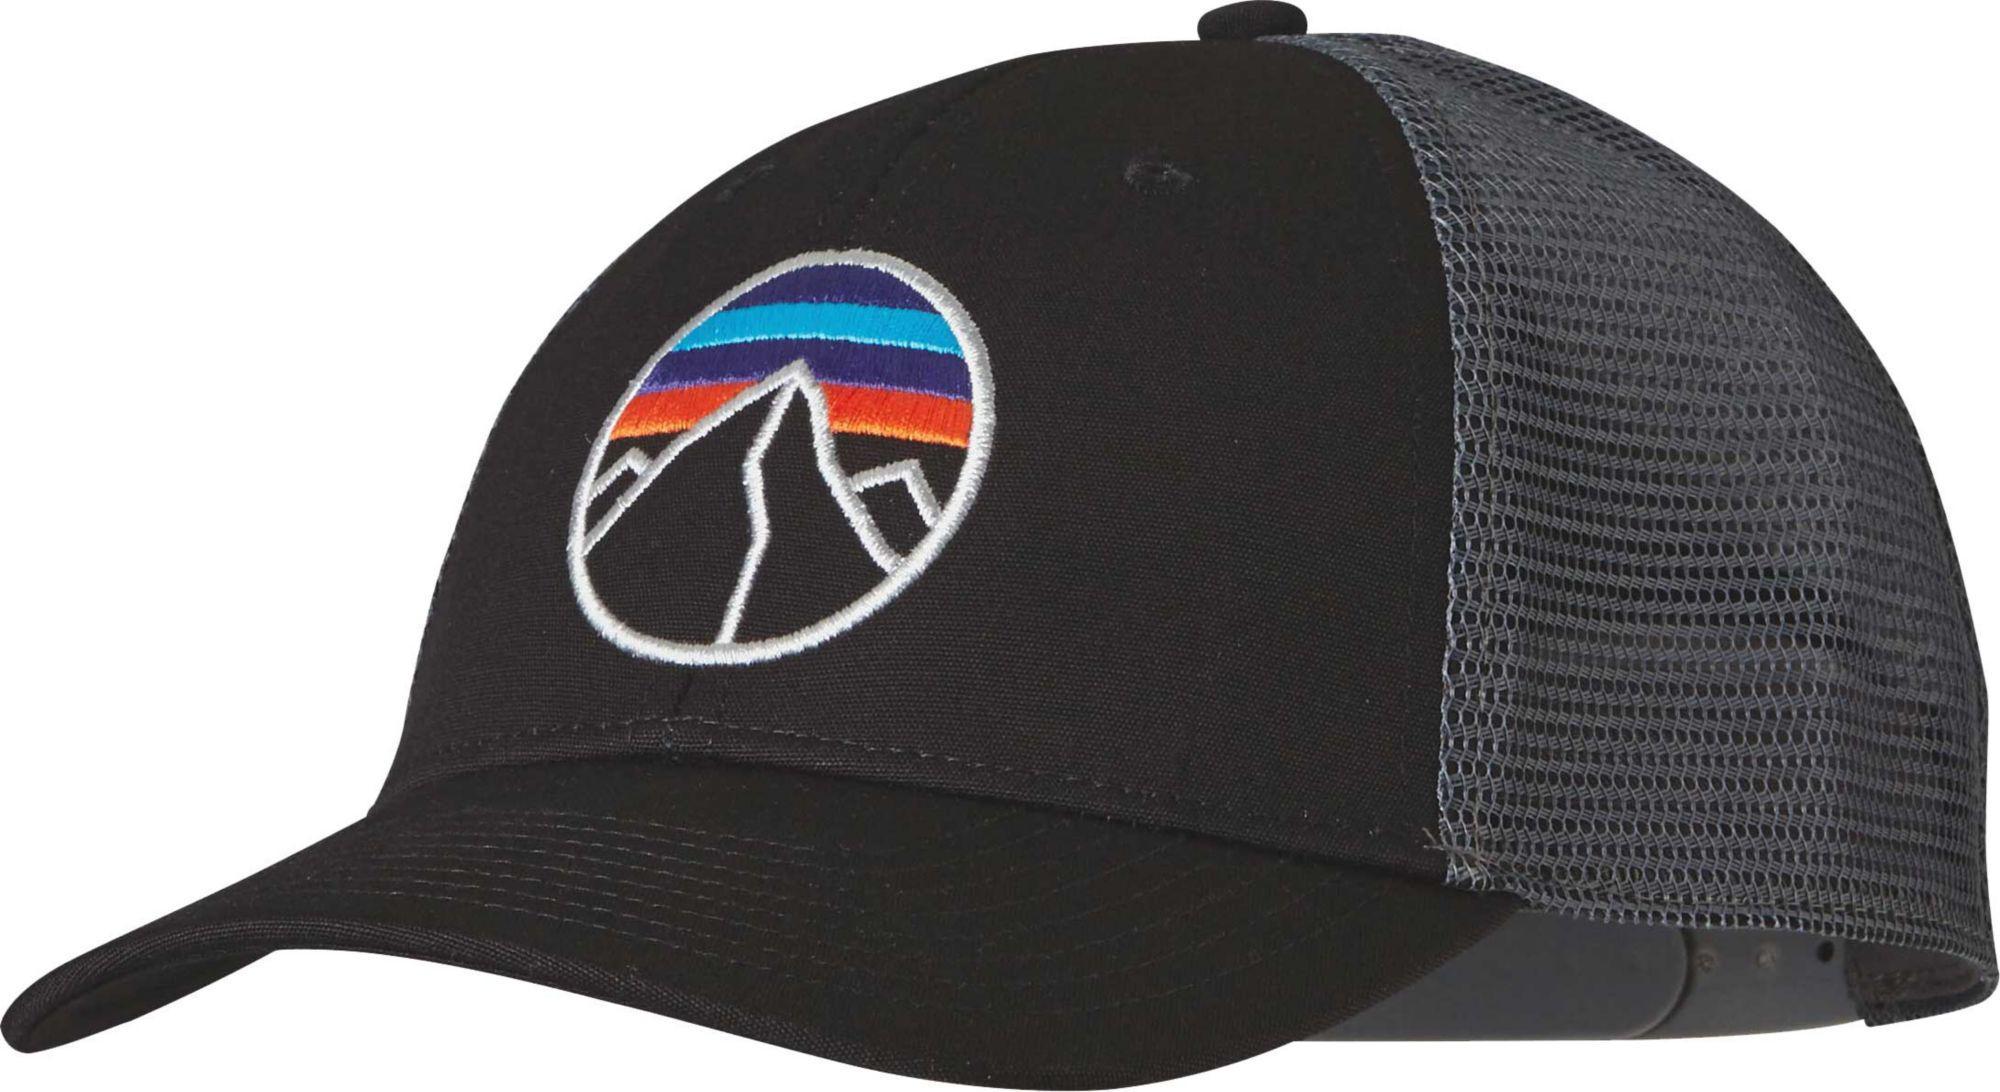 48a6b63bd Patagonia Fitz Roy Emblem Lopro Trucker Hat in Black for Men - Lyst